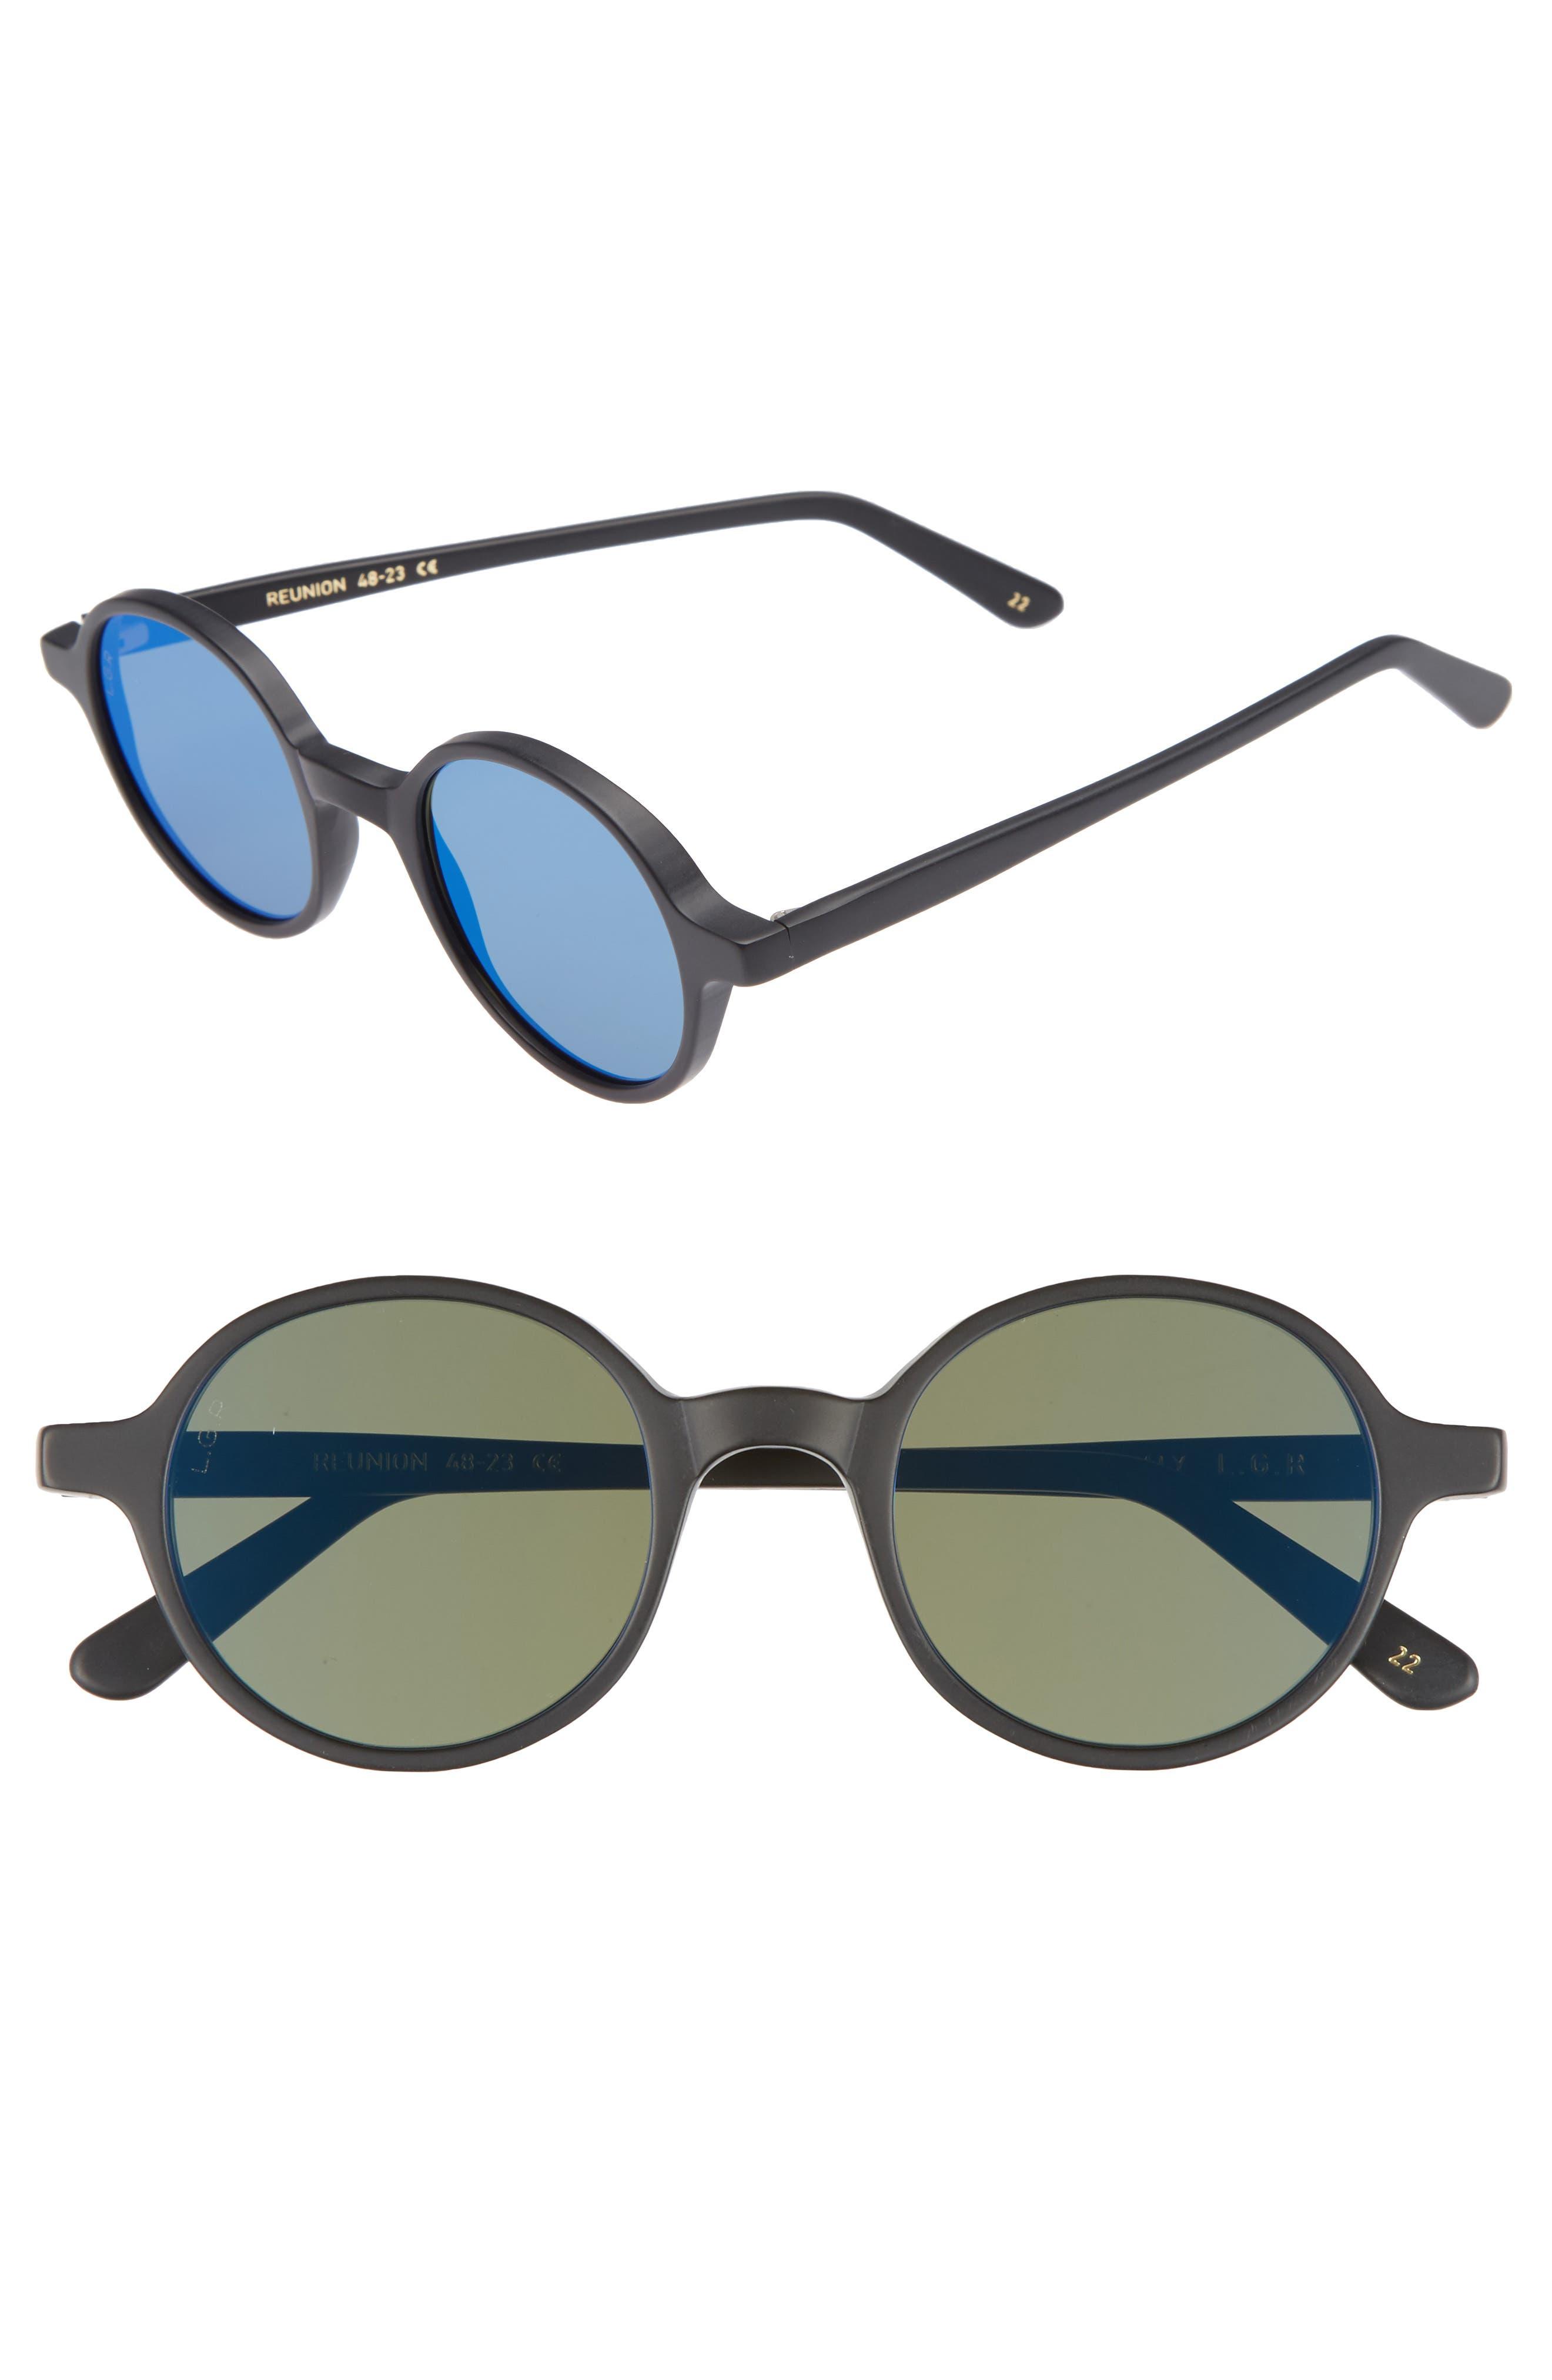 Reunion 48mm Sunglasses,                             Main thumbnail 1, color,                             001